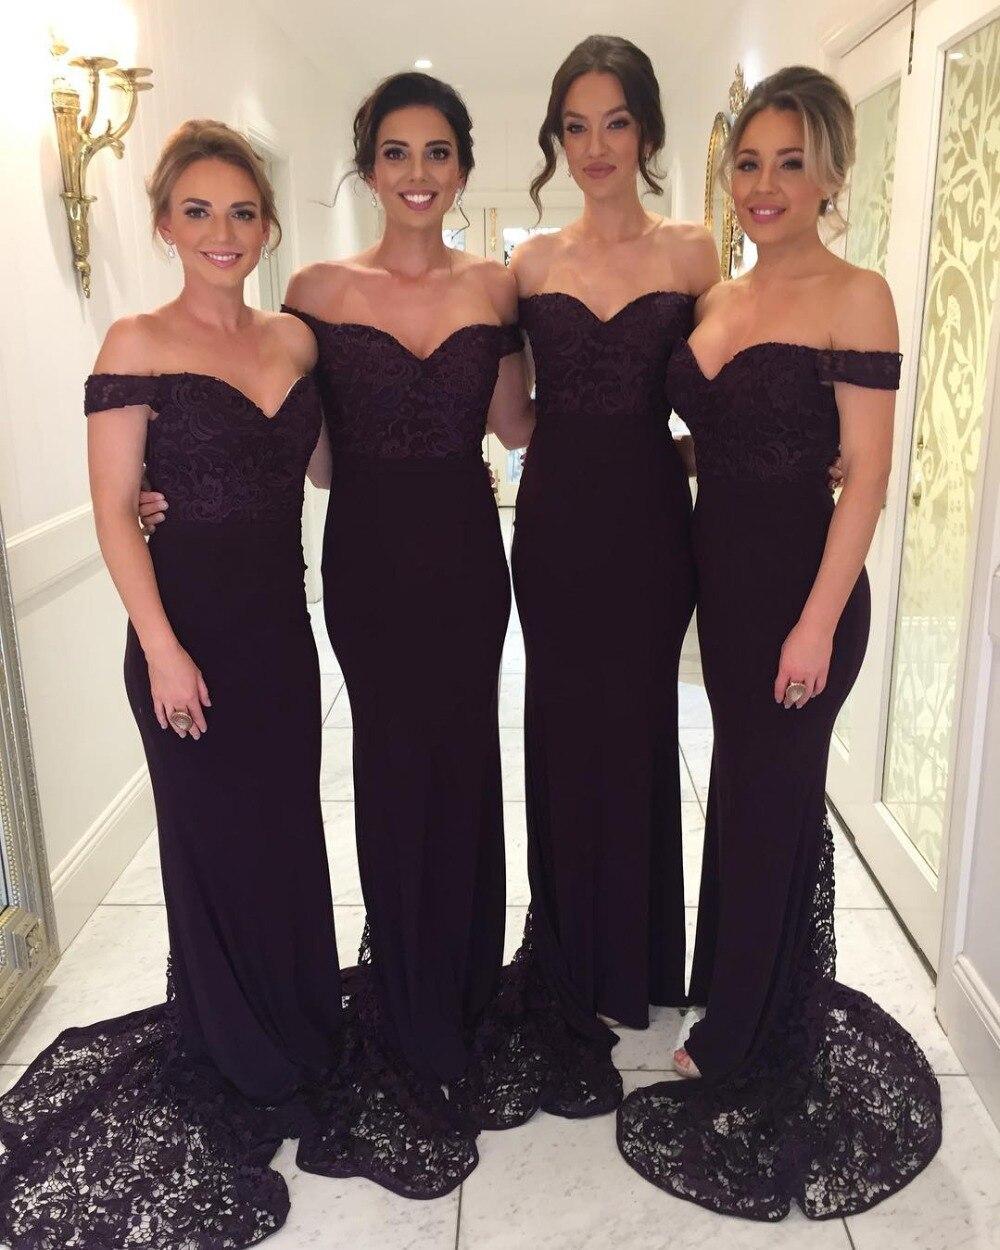 Robe Demoiselle D'honneur Sexy V Neck Purple Mermaid Bridemaid Dresses 2019 Off The Shoulder Prom Dresses Wedding Party Gowns